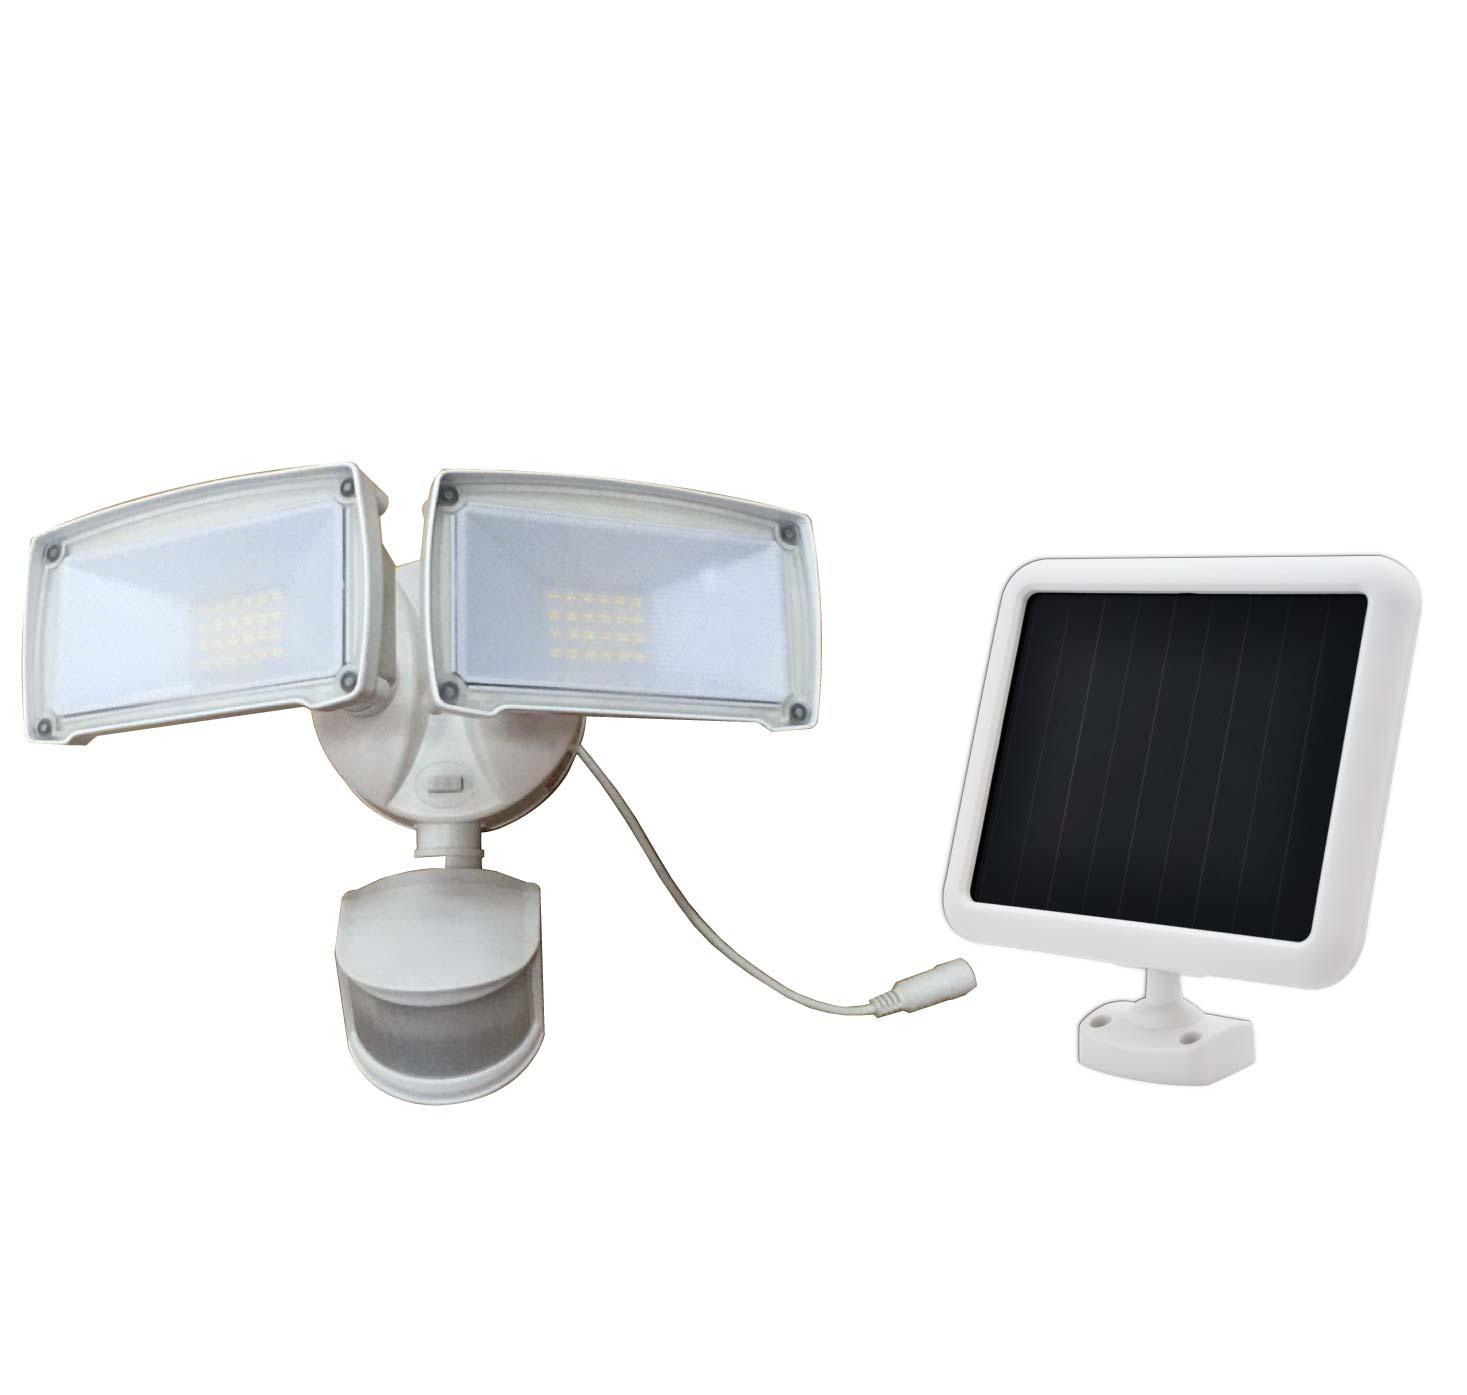 dualhead security spotlight solar powered motion sensing security lighting from creative industries